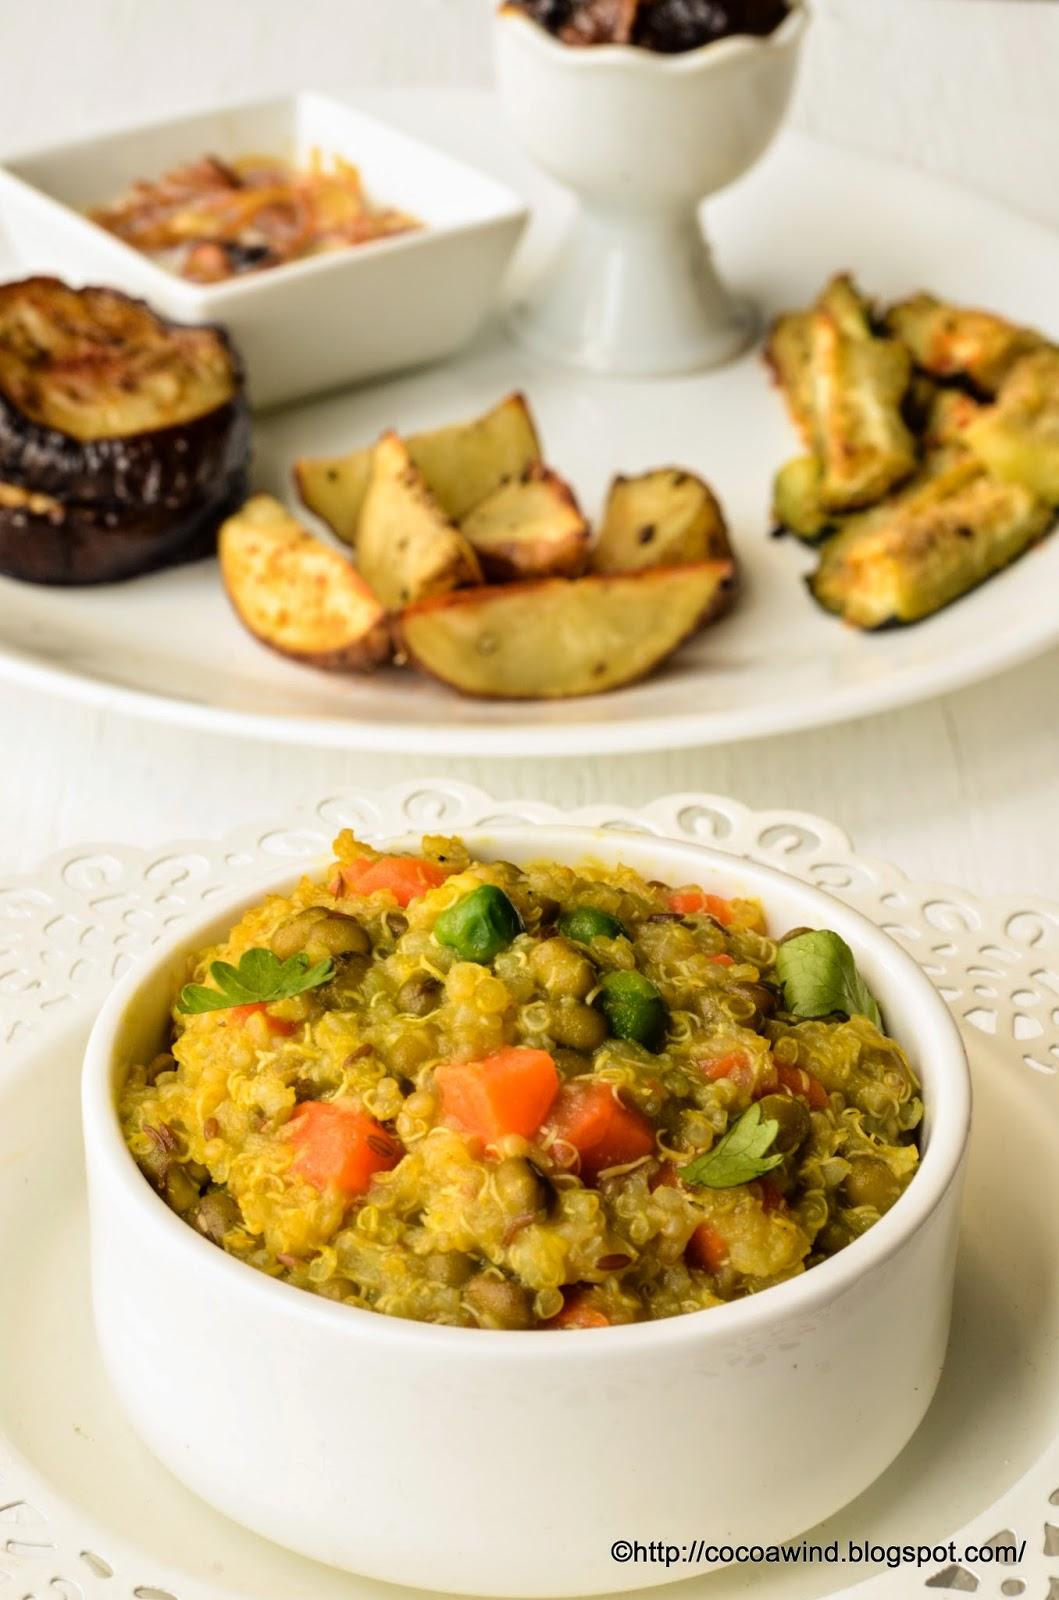 Quinoa-Green Moong Daal Khichdi & Baked Veggies